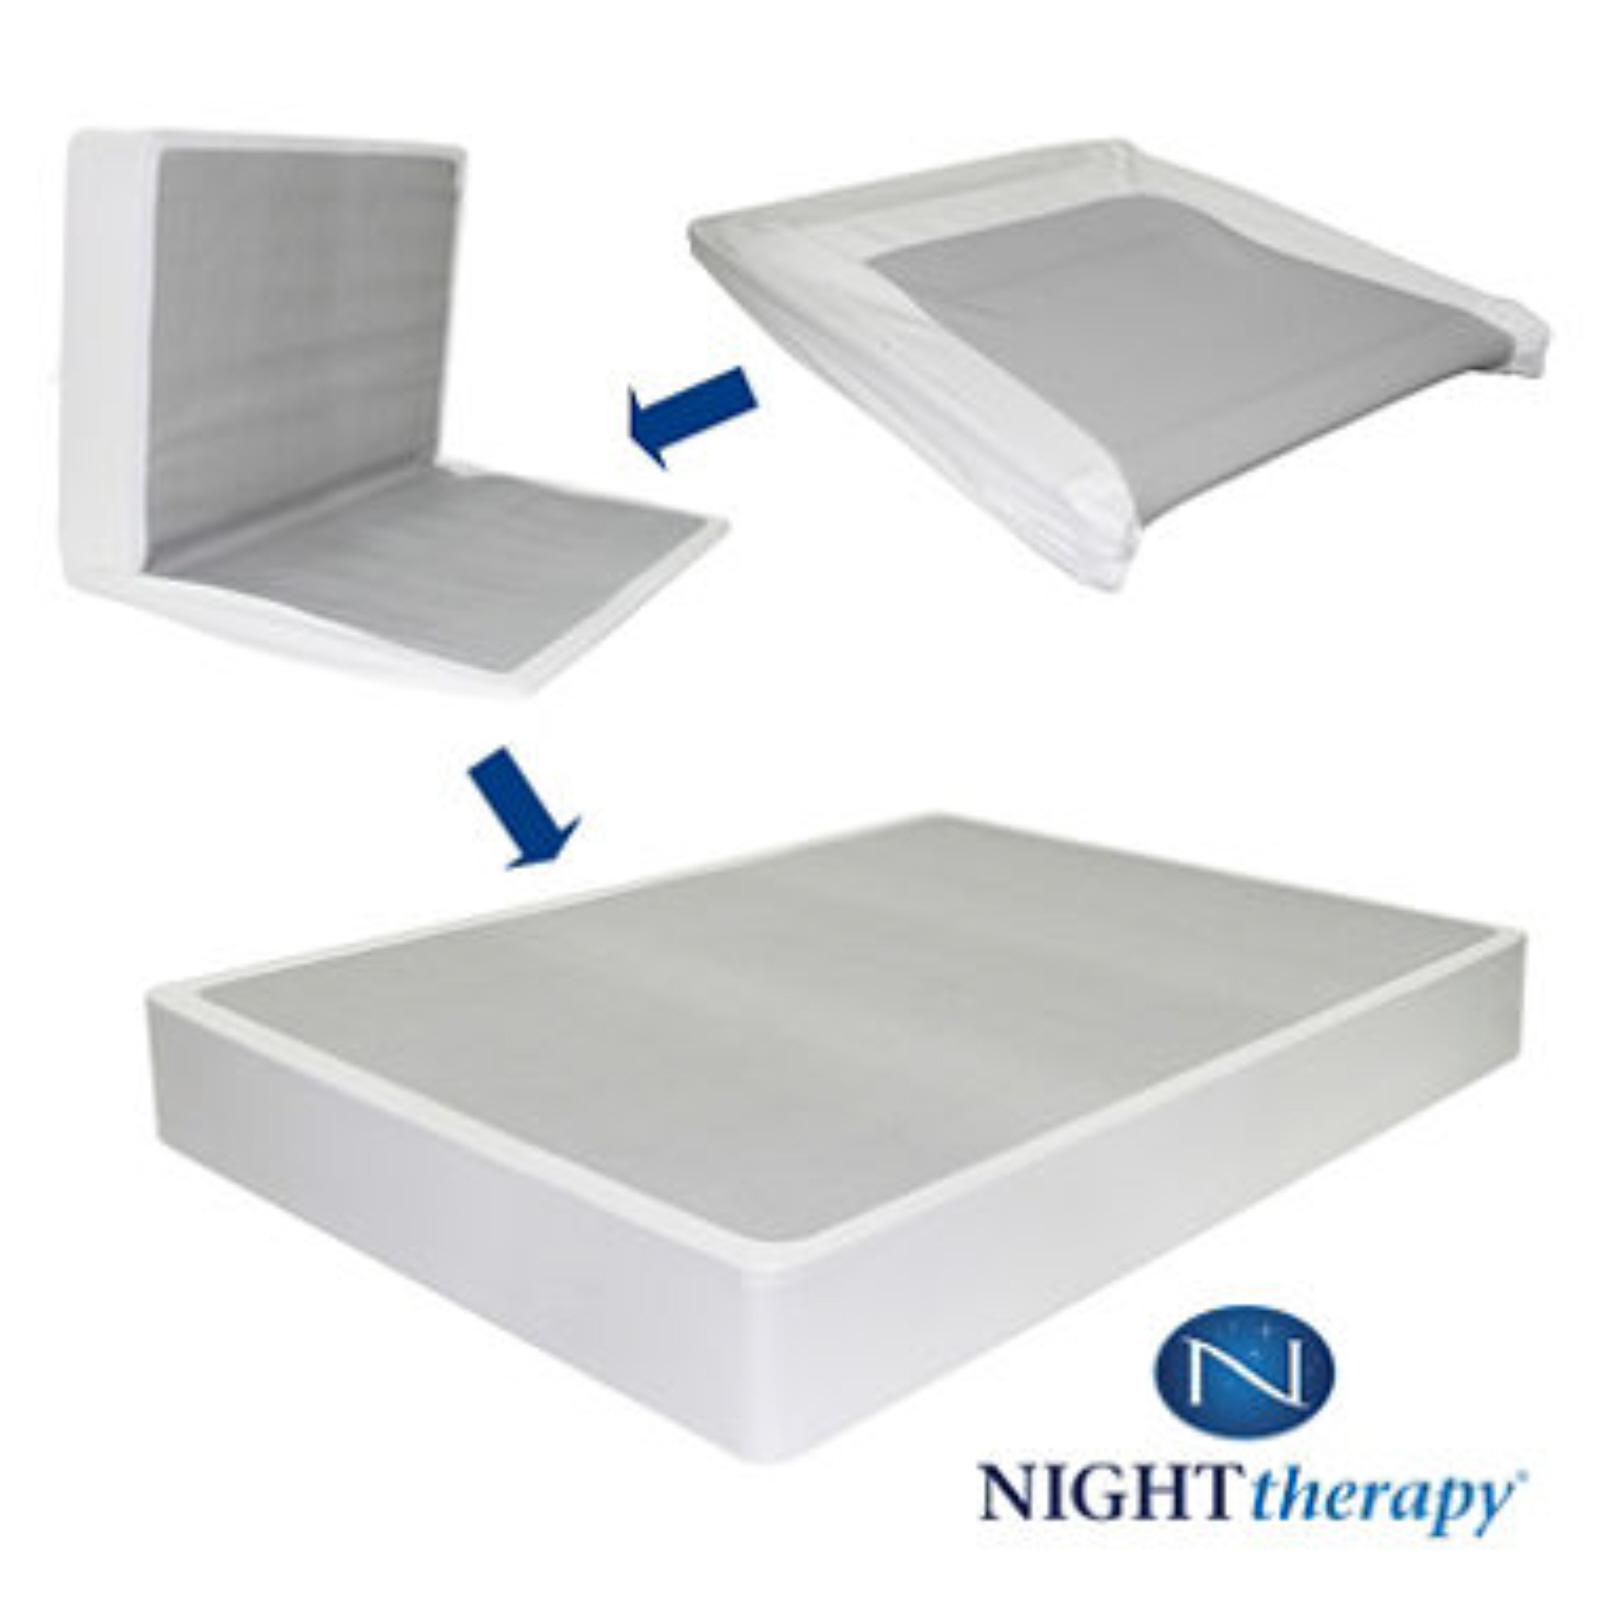 8 Night Therapy Spring Mattress Bi Fold Box Spring Set Xl Twin Bedroomfurniture Beds Mattresses